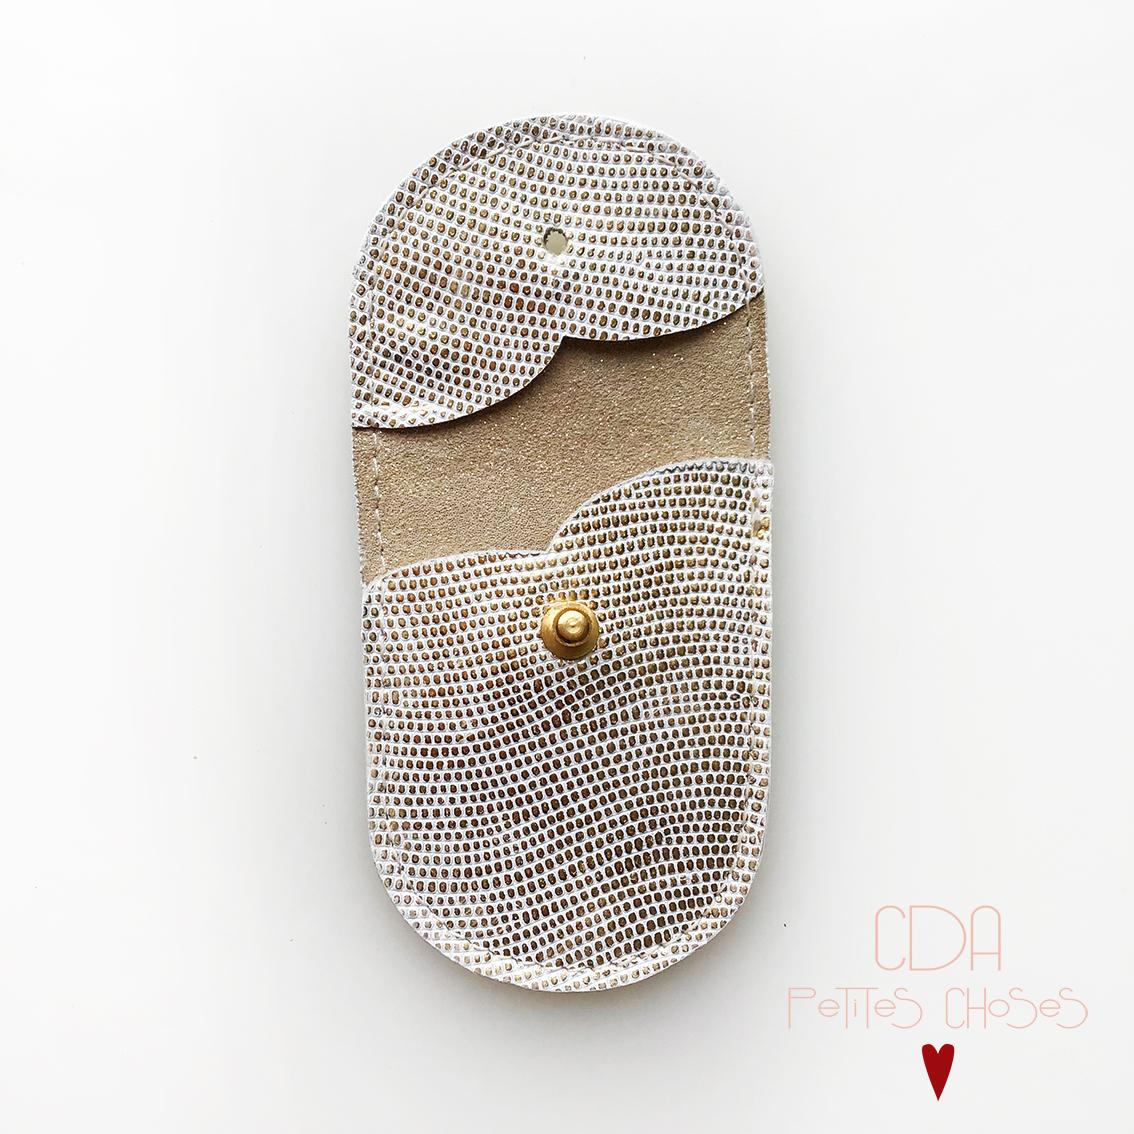 mini-pochette-en-cuir-embosse-galuchat-or-2 CDA petites Choses